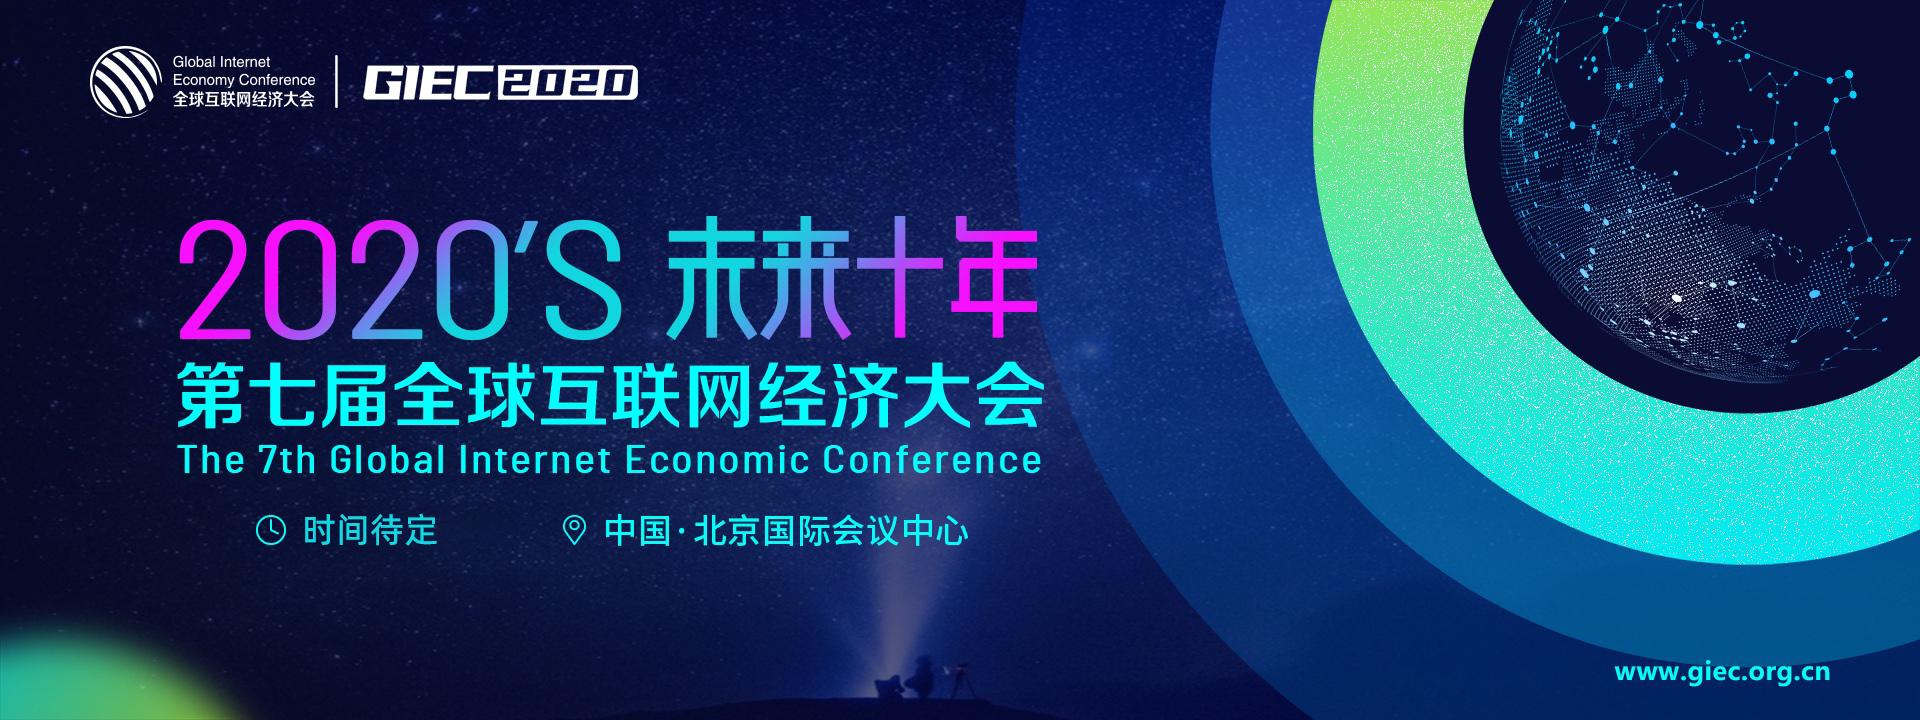 GIEC2020第七届全球互联网经济大会